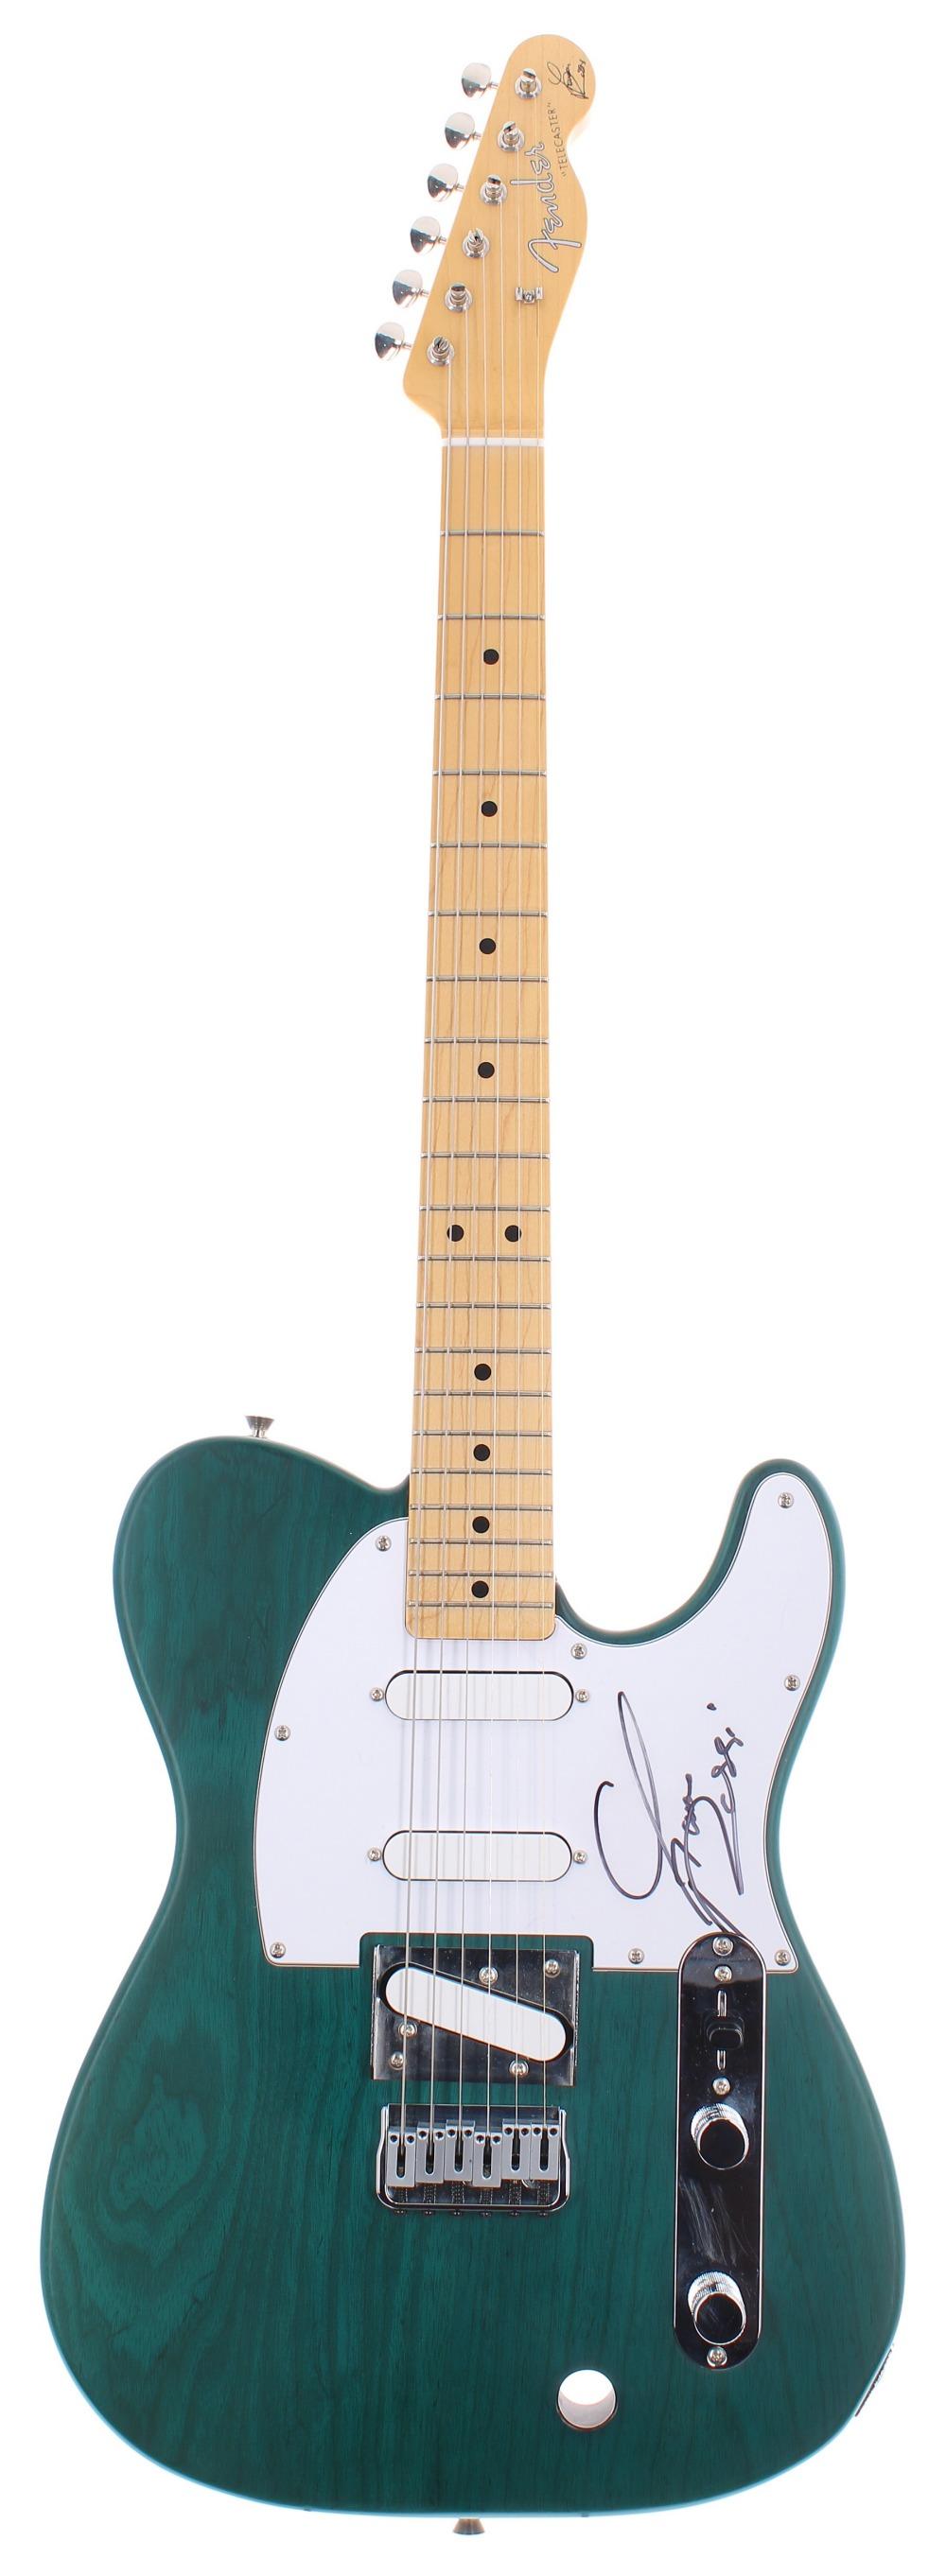 Status Quo - Francis Rossi and Rick Parfitt Signature Edition Fender Telecaster electric guitars, - Image 4 of 6